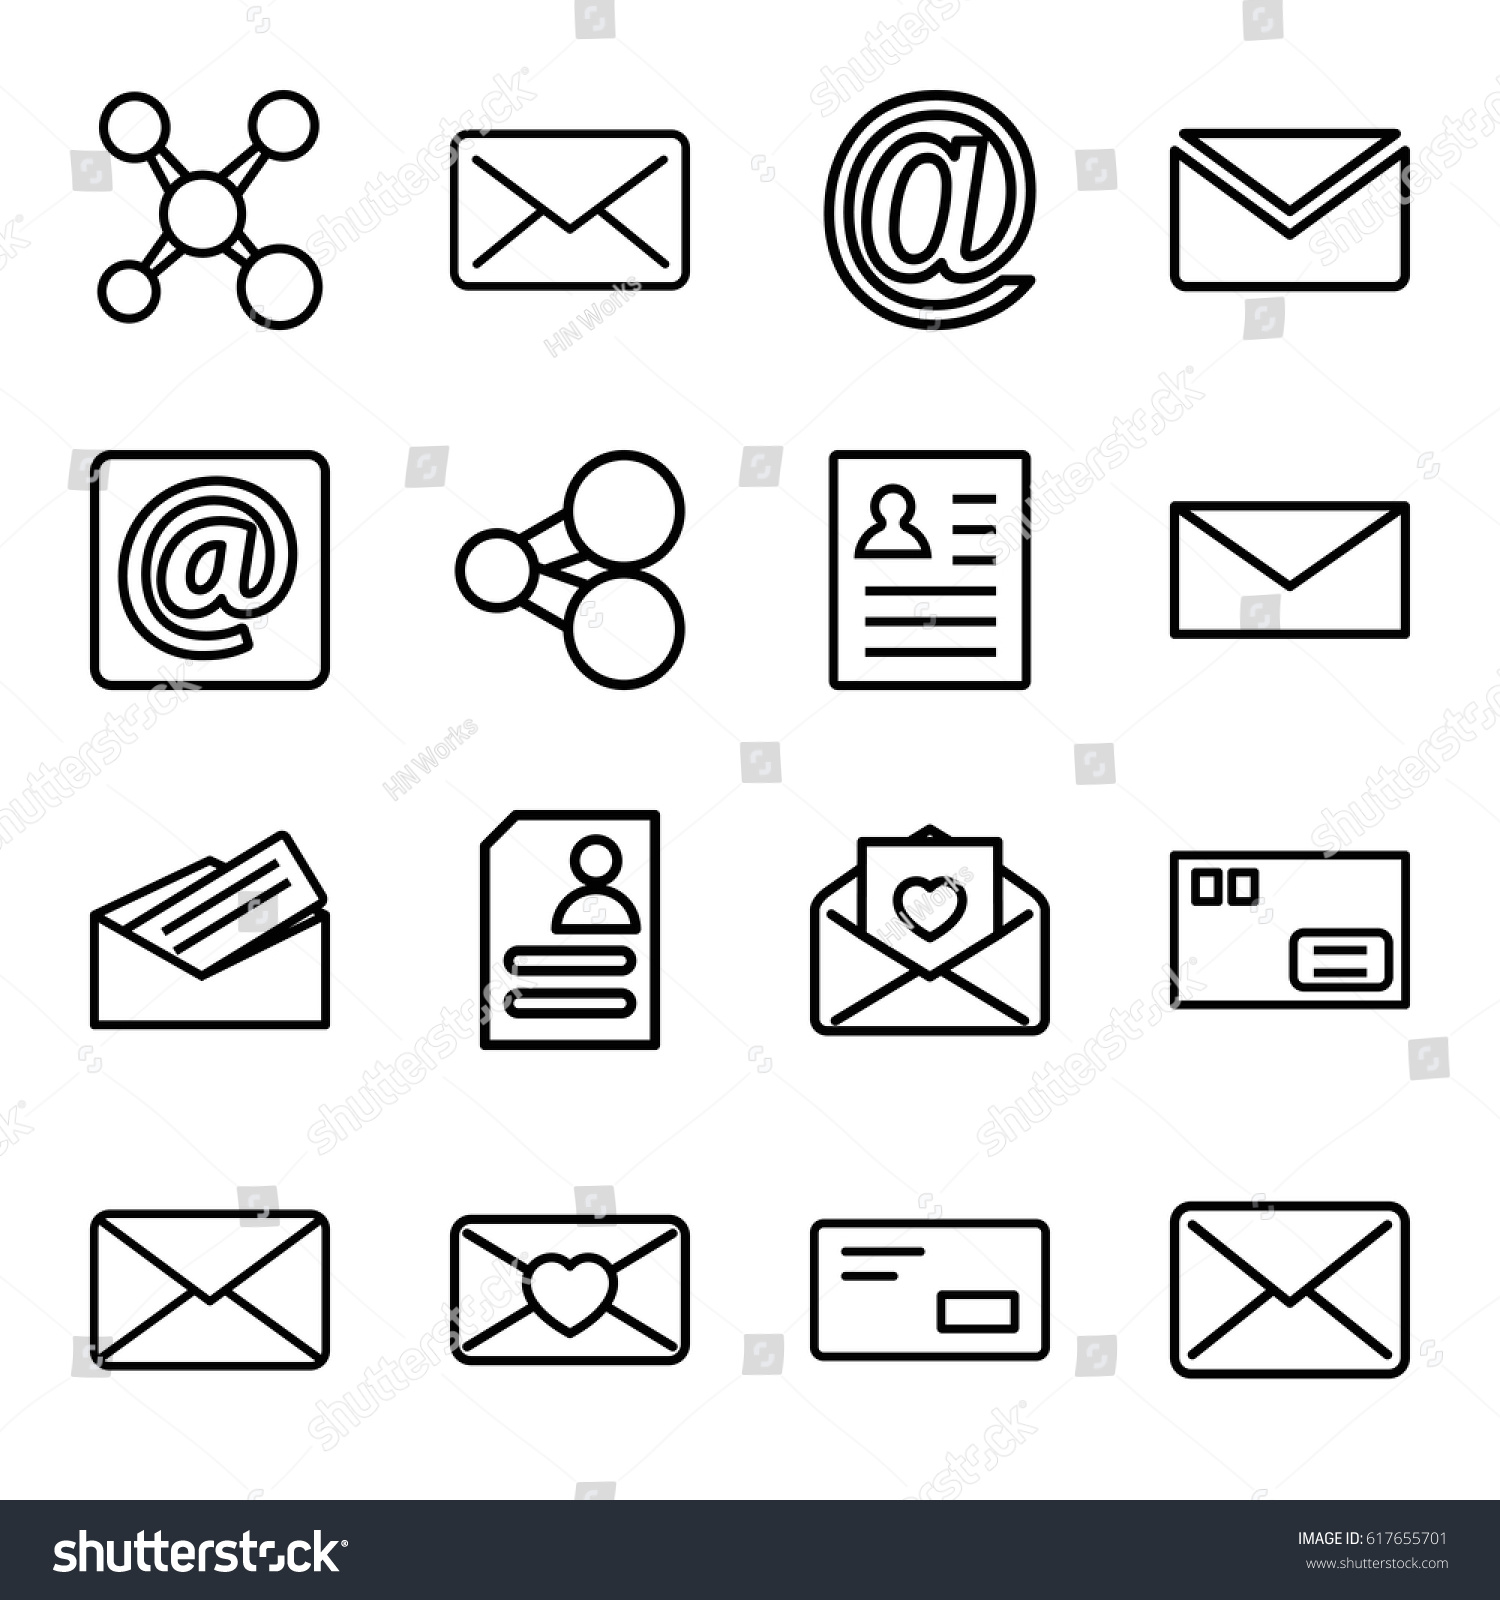 Send Icons Set Set 16 Send Stock Vector (Royalty Free) 617655701 ...